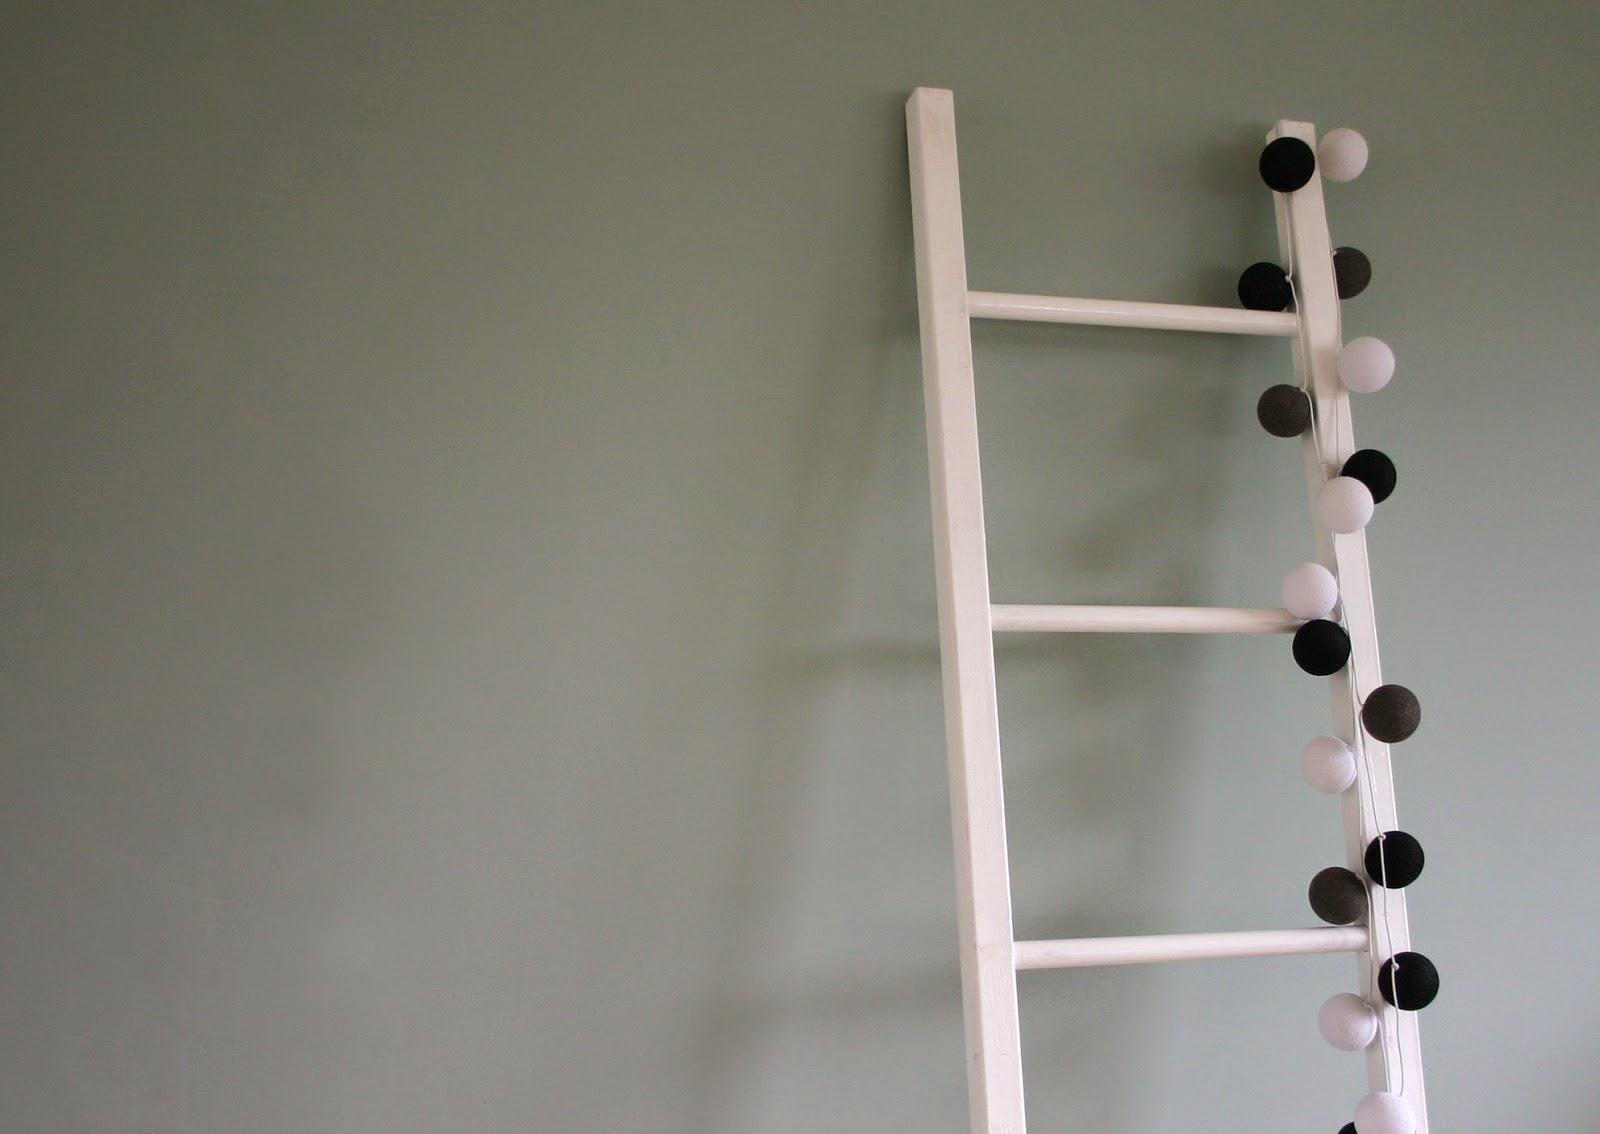 Walra Kirsten Sierkussen 45 x 45 cm - Groen  mijnhuis# ...